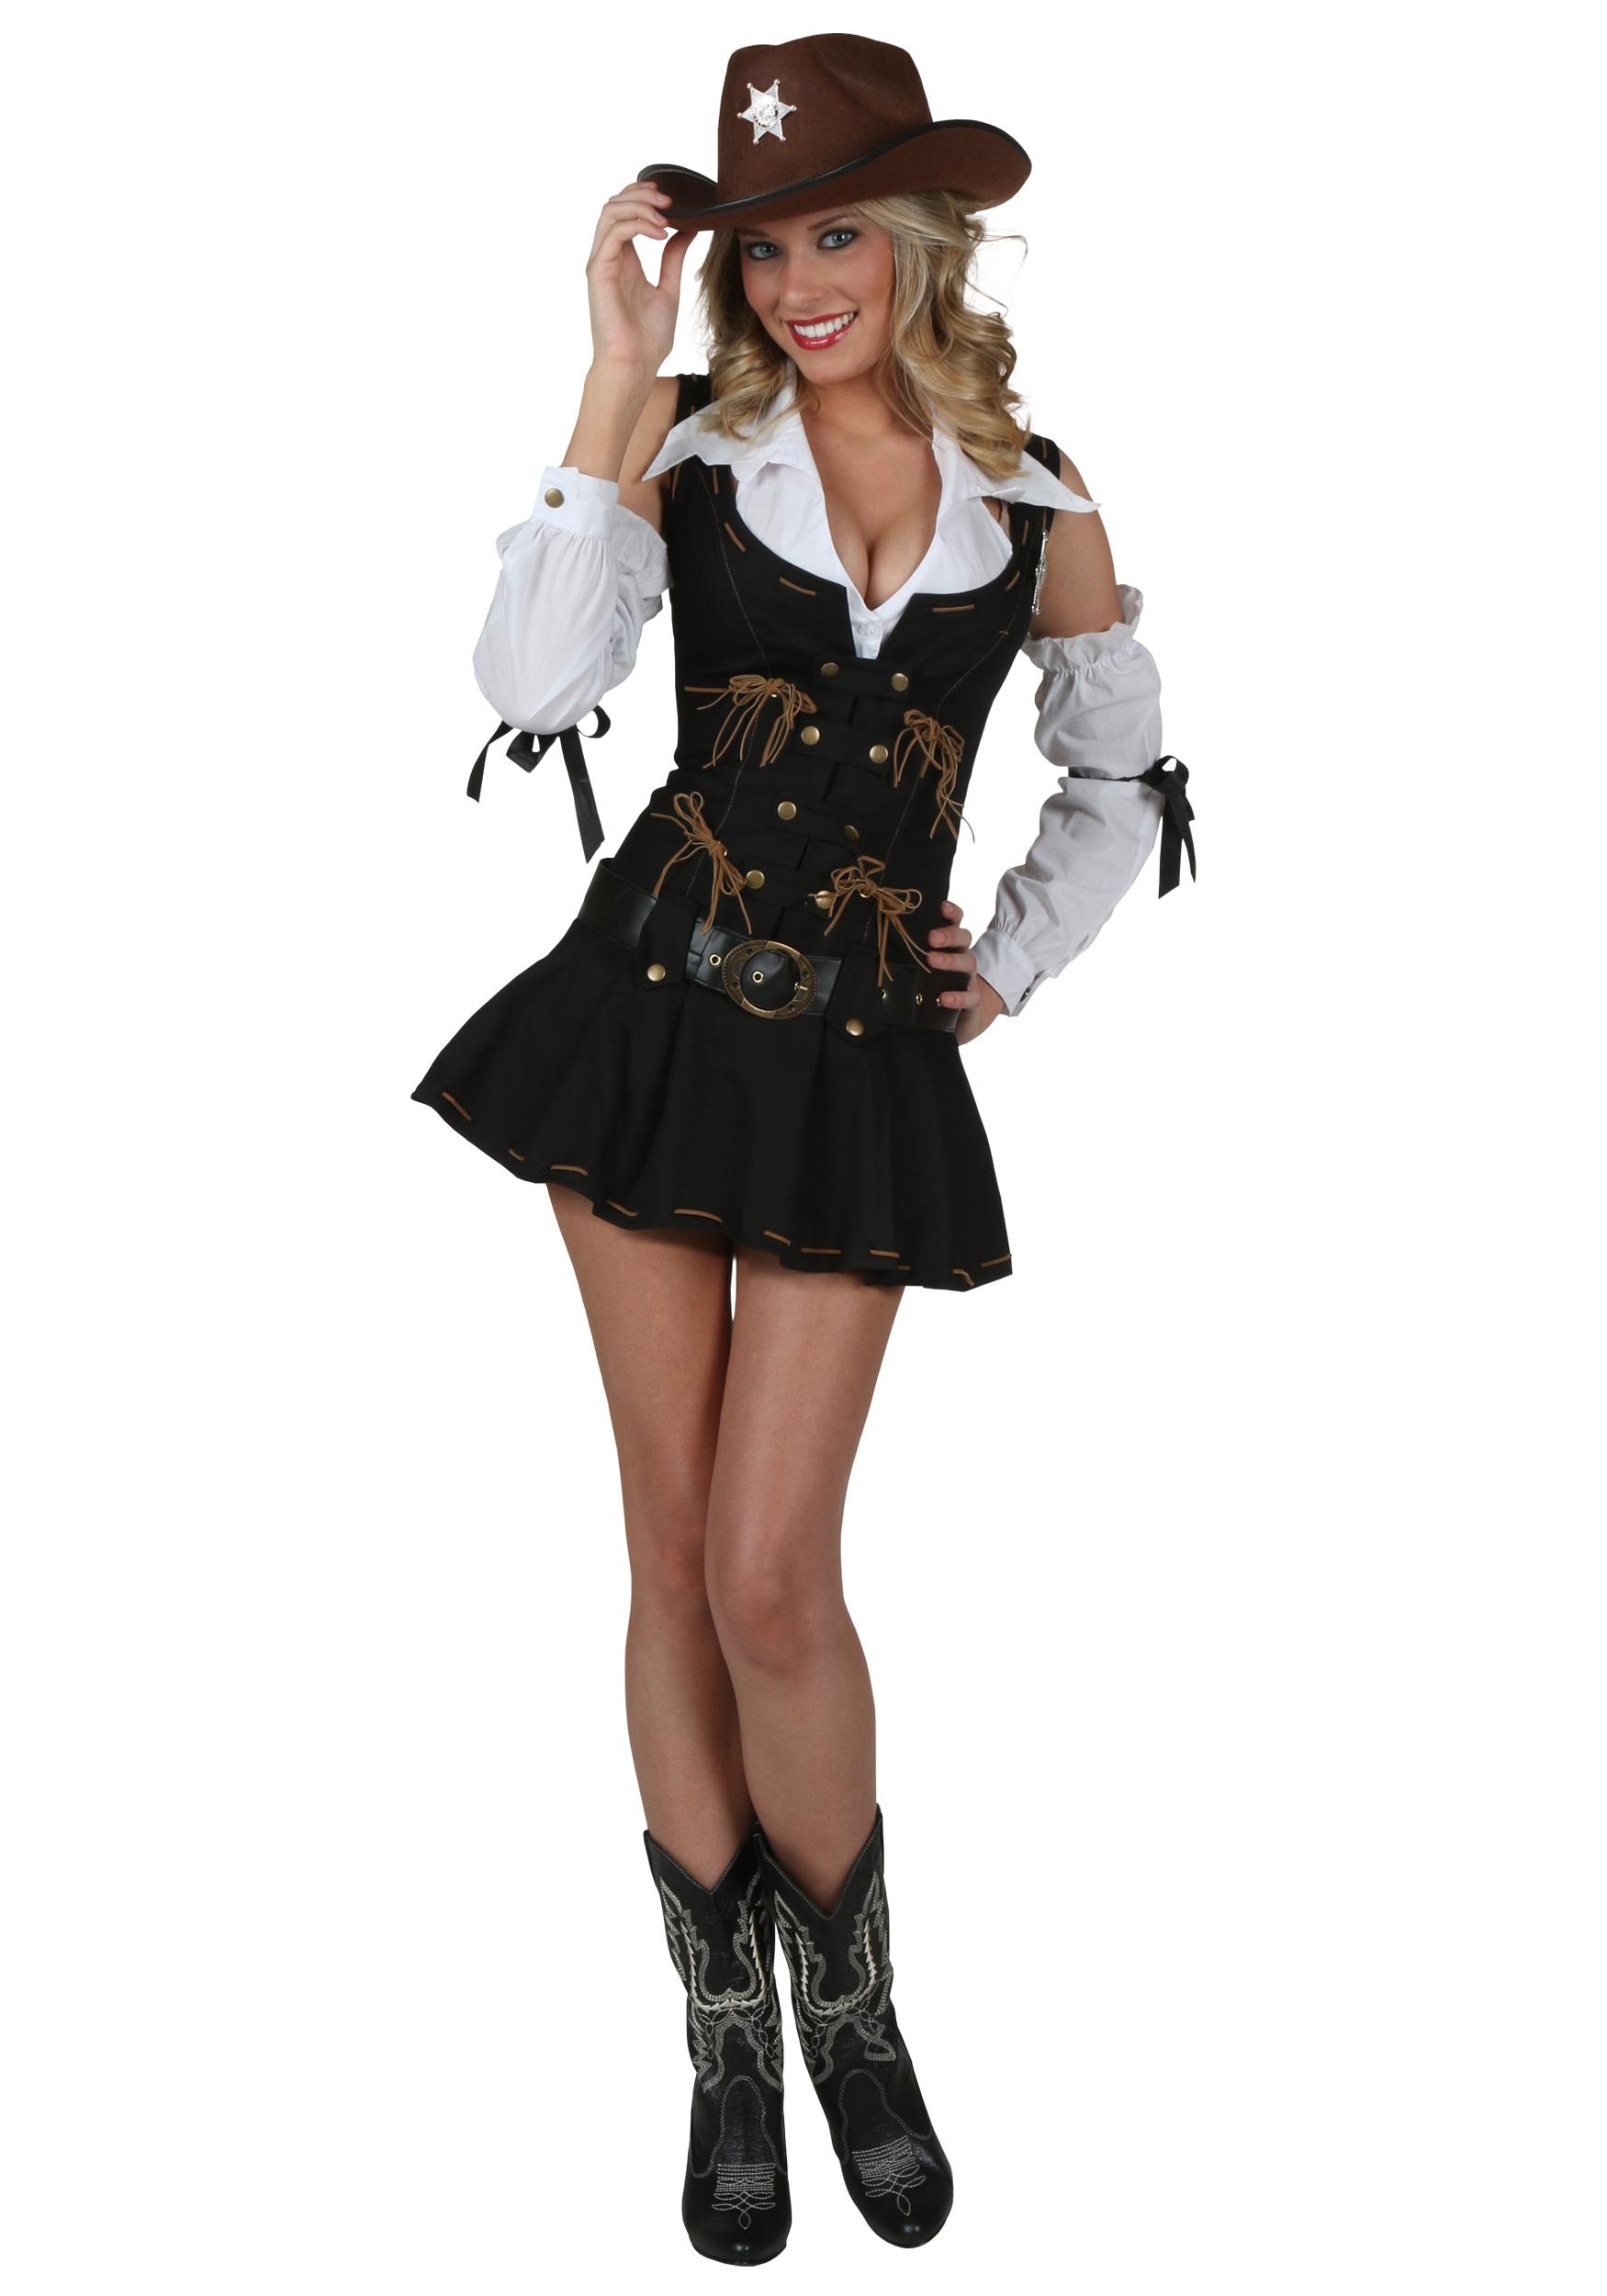 76233e487bcca Sexy Wild West Sheriff Costume